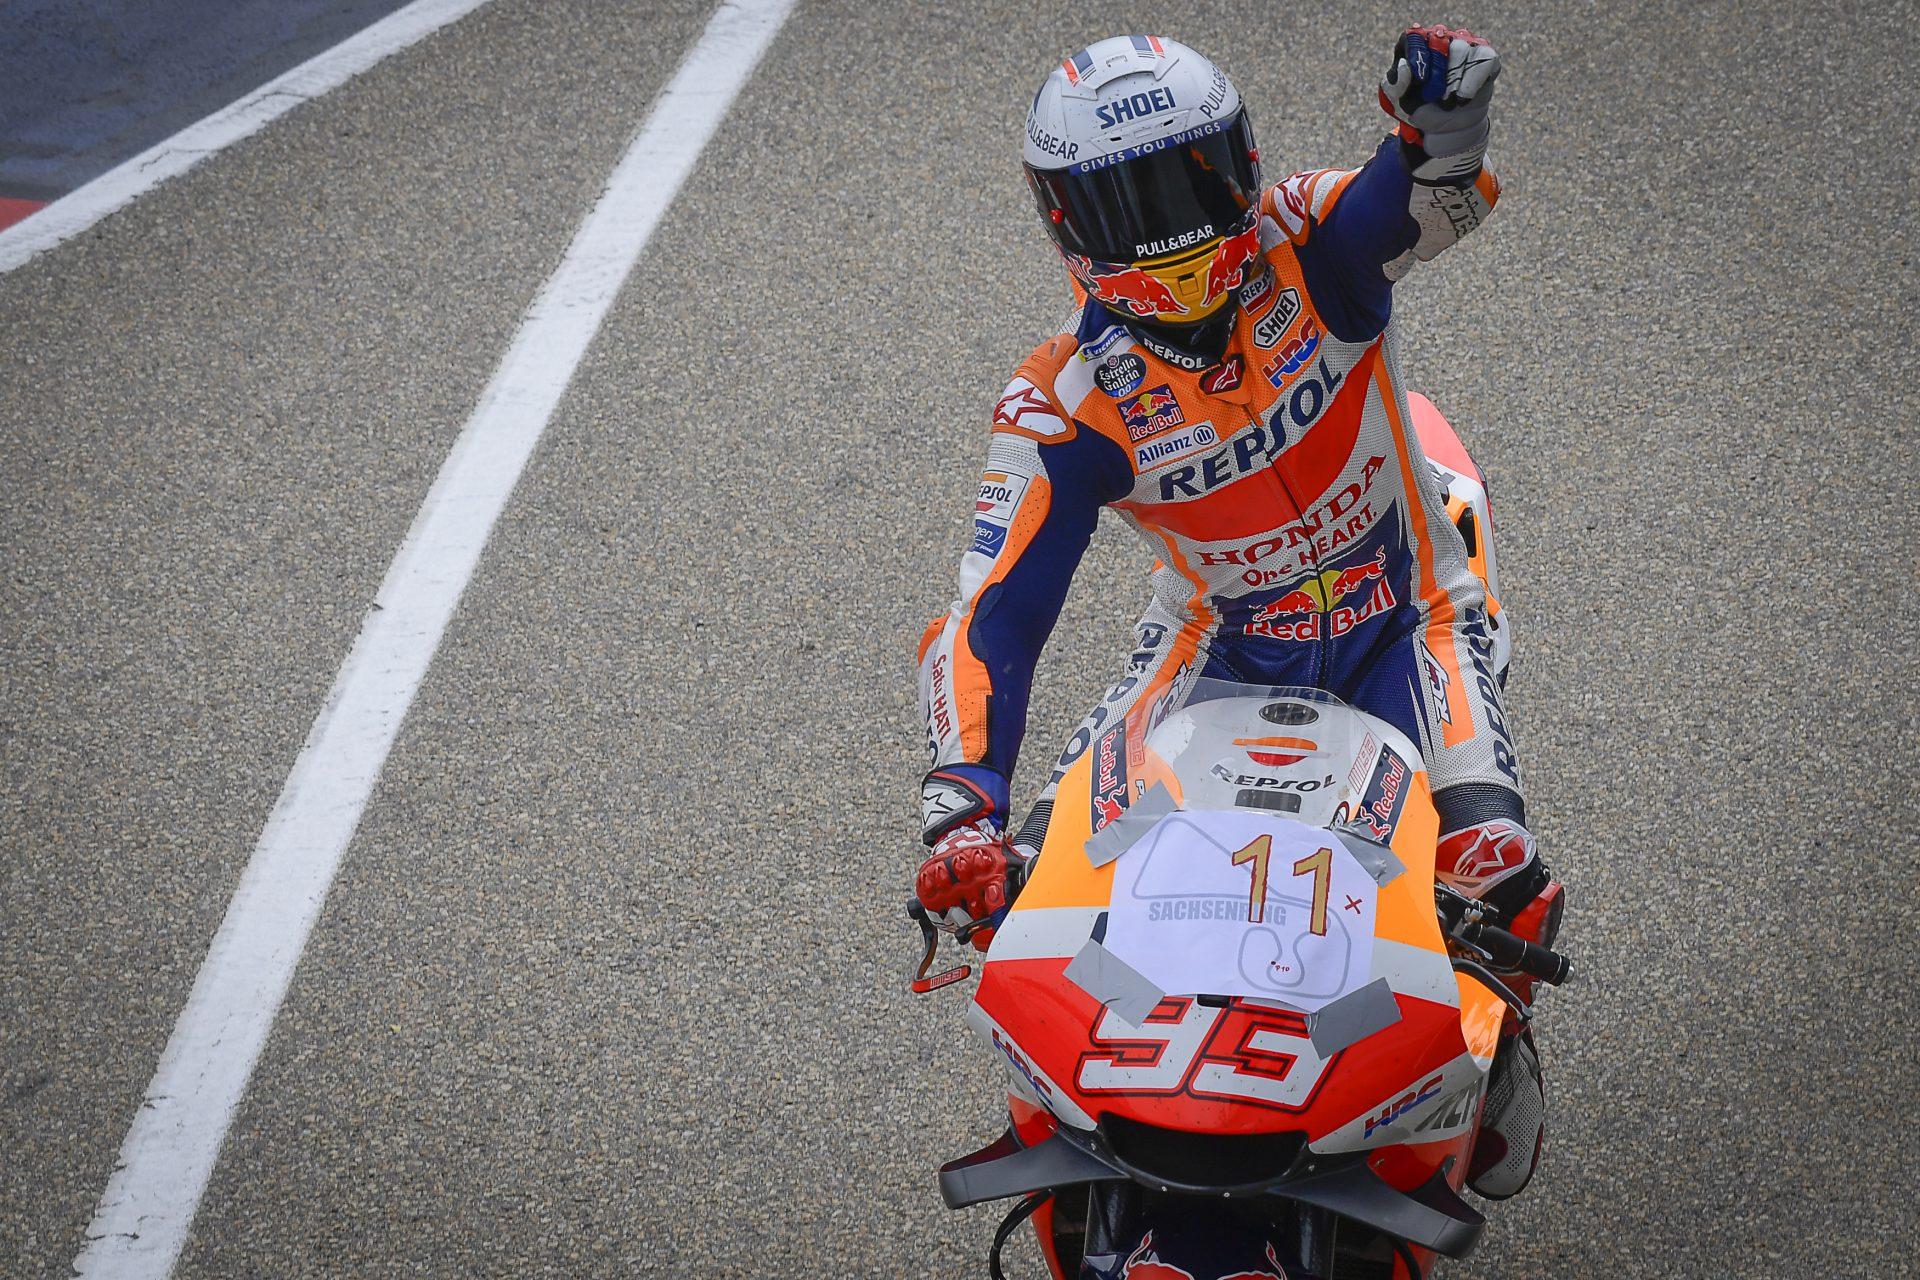 #KingOfTheRing: Marquez returns to claim his throne